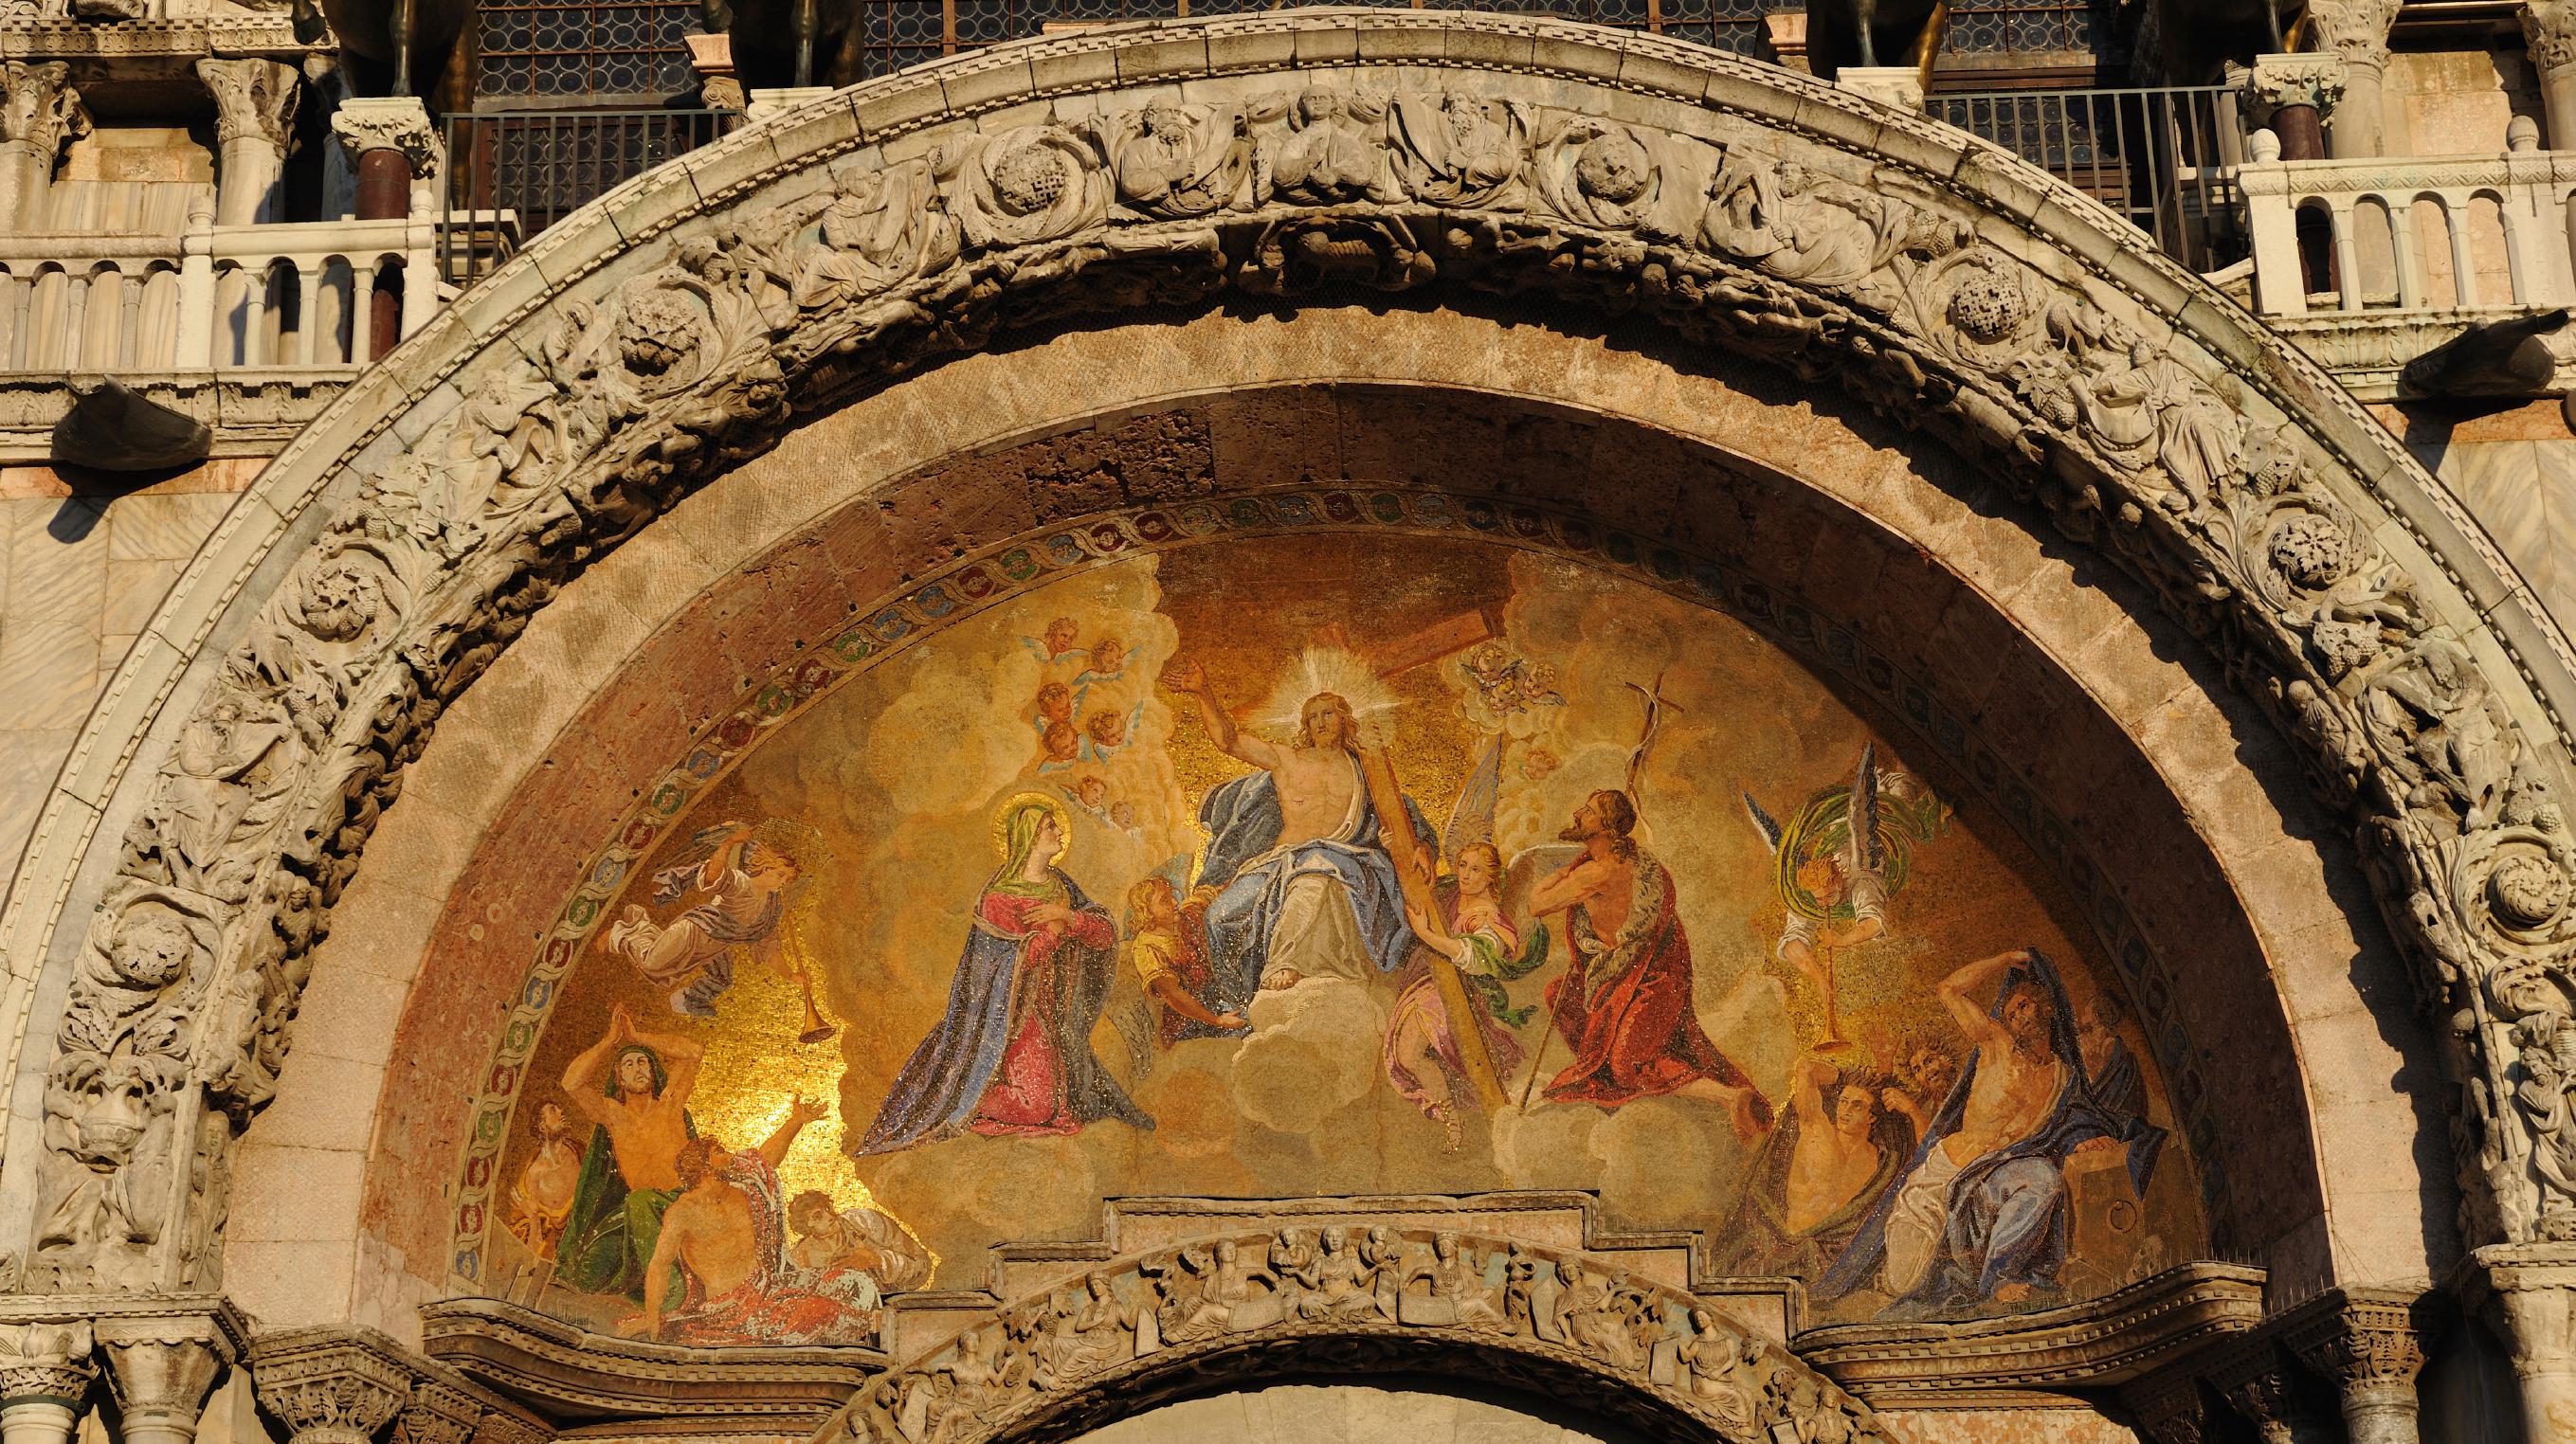 Ssan Marco Venice www.istockphoto.com:photo:san-marco-basilica-in-venice-gm98427422-11113136?st=325ce36